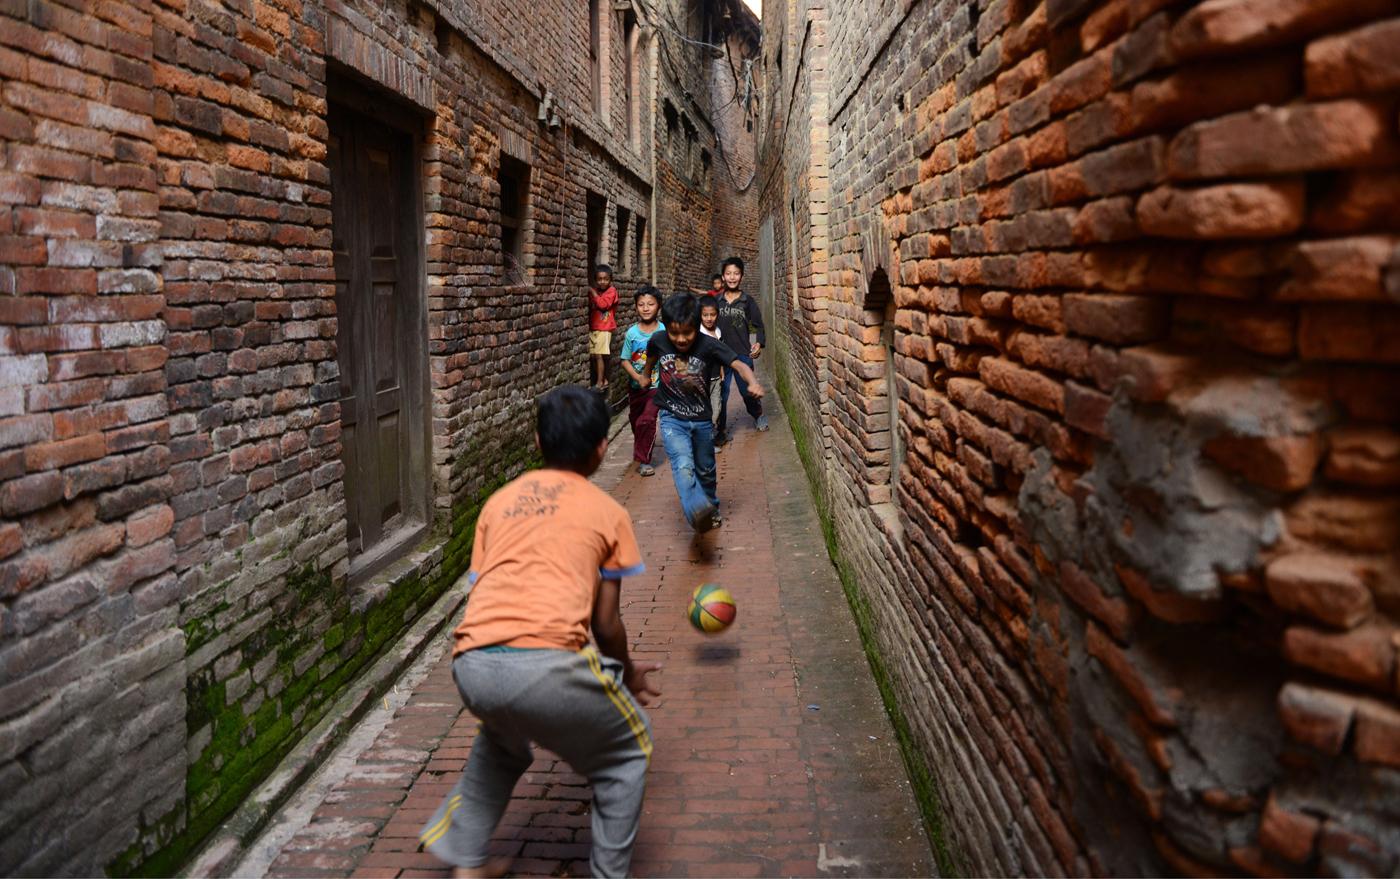 Football? Futsal? If it involves kicking a ball around, they'll play it in Nepal